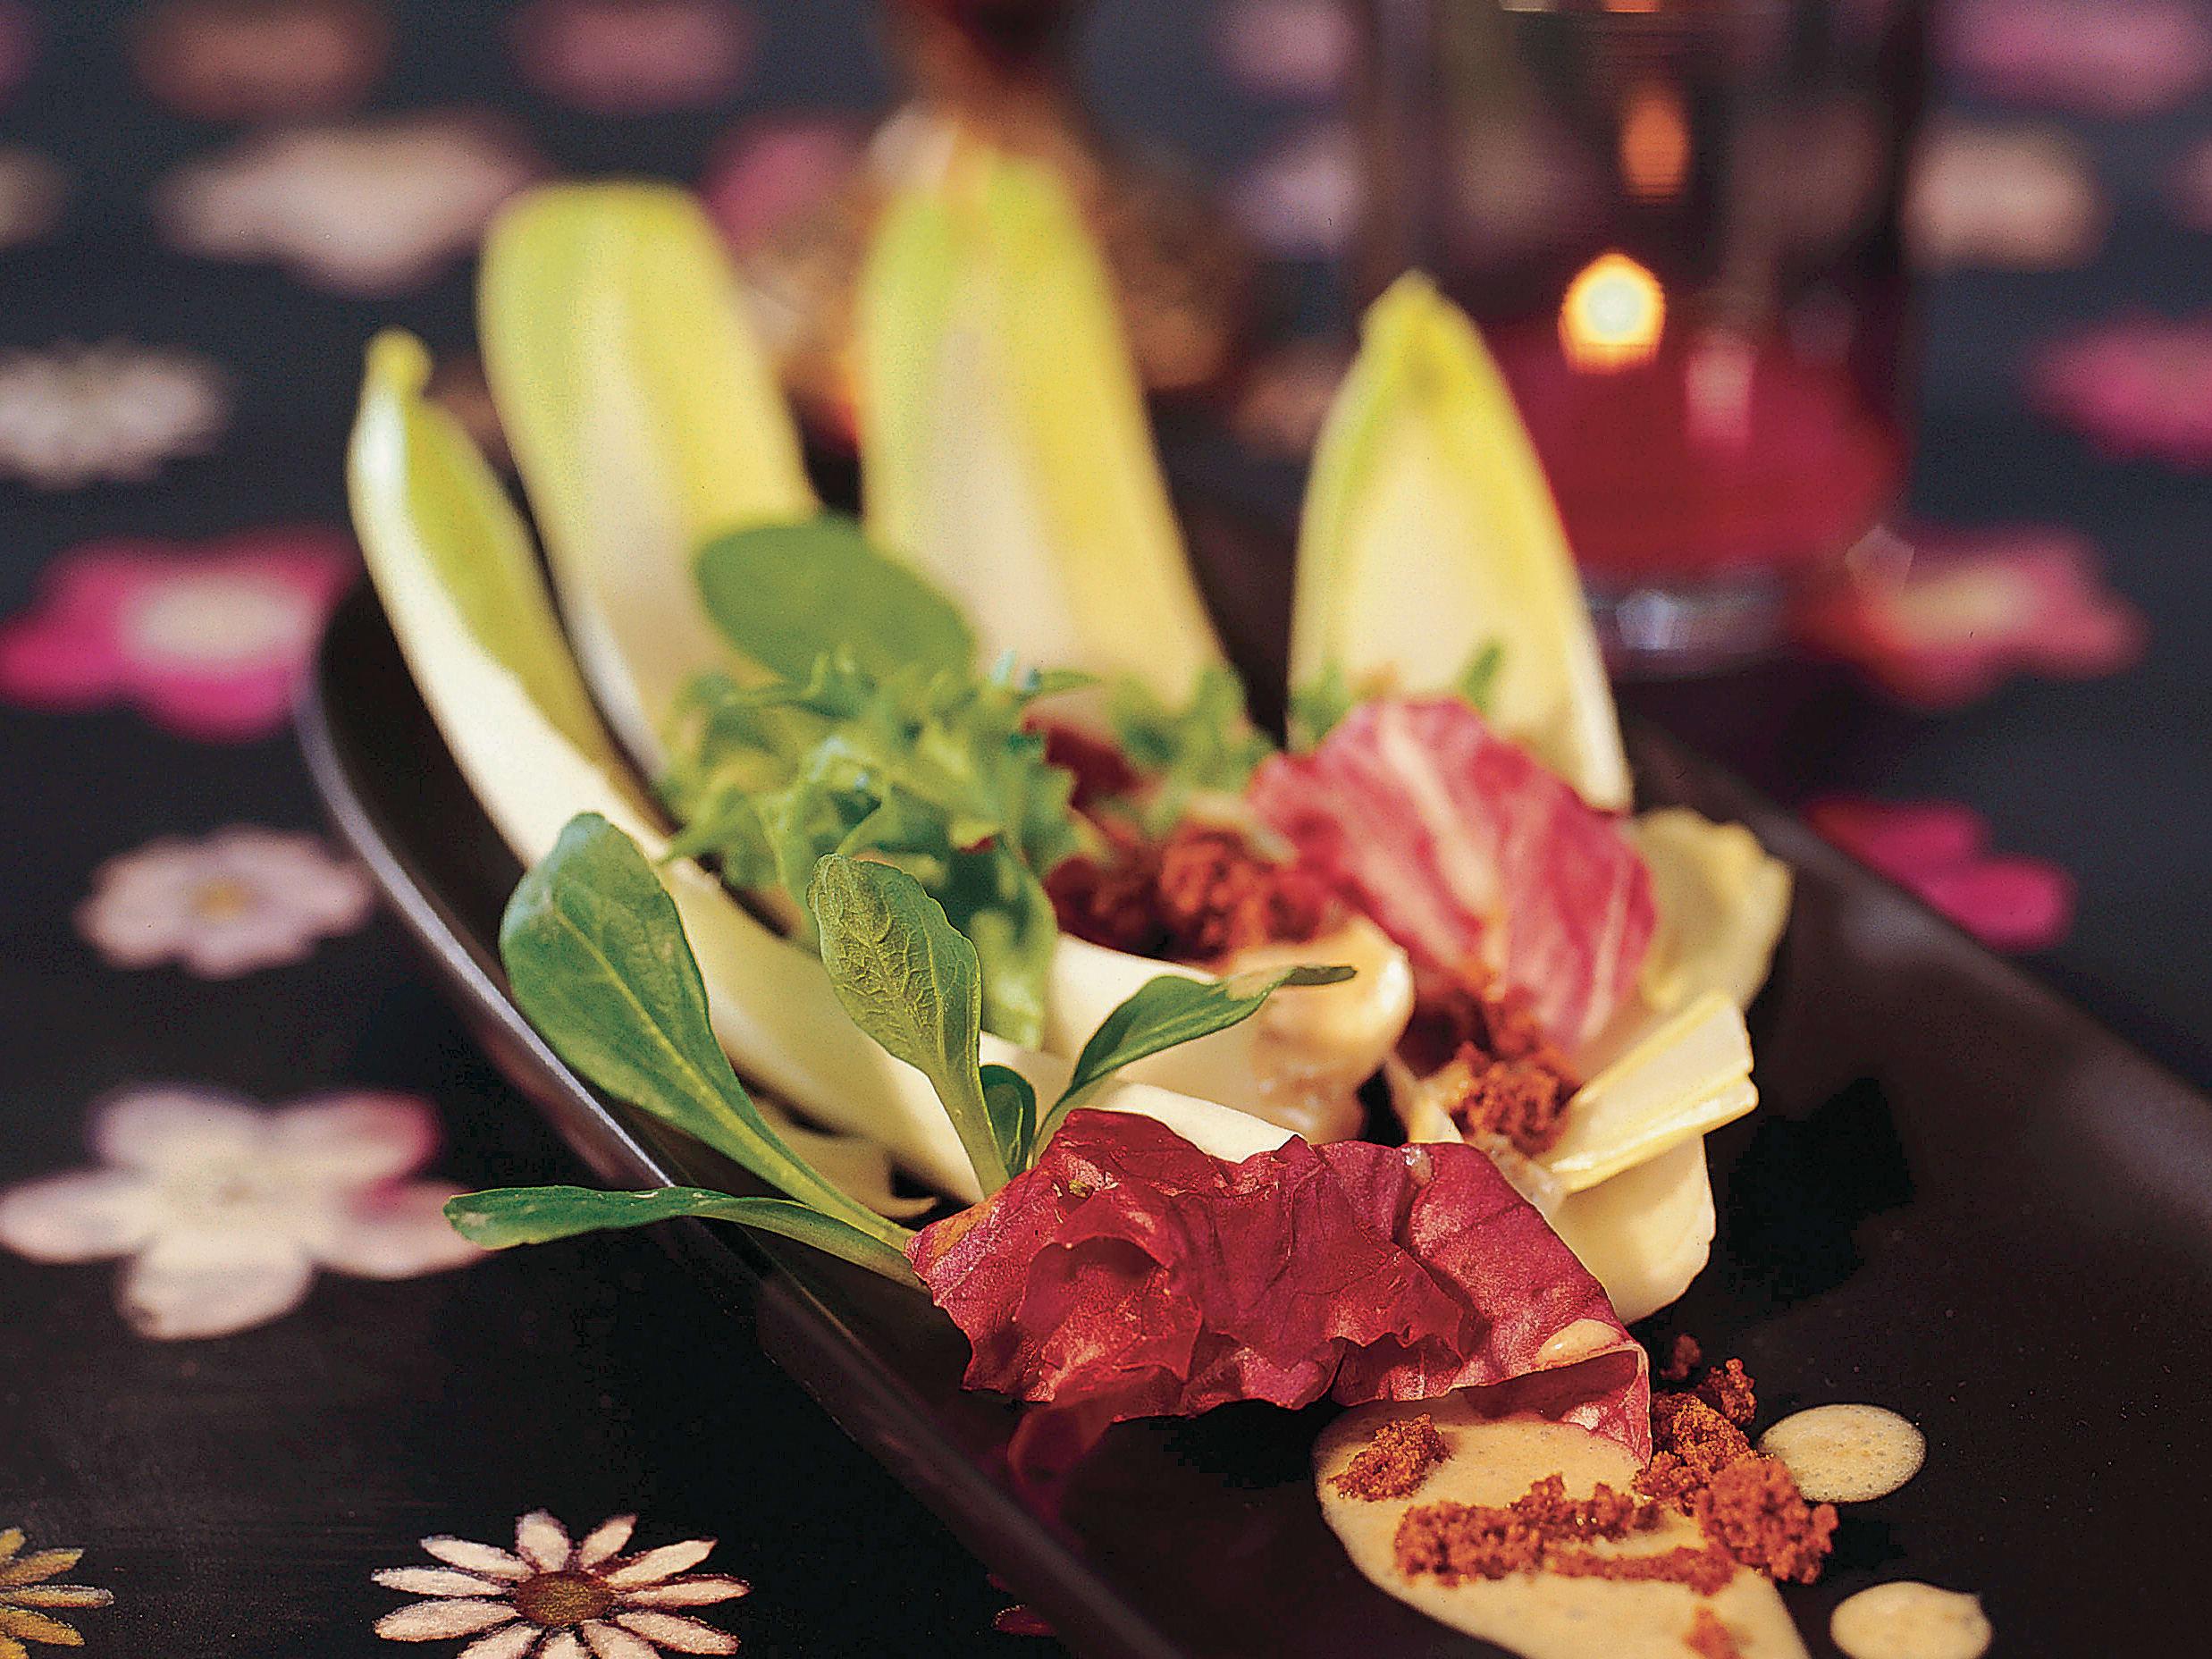 Salade verte mêlée sauce pain d'épice